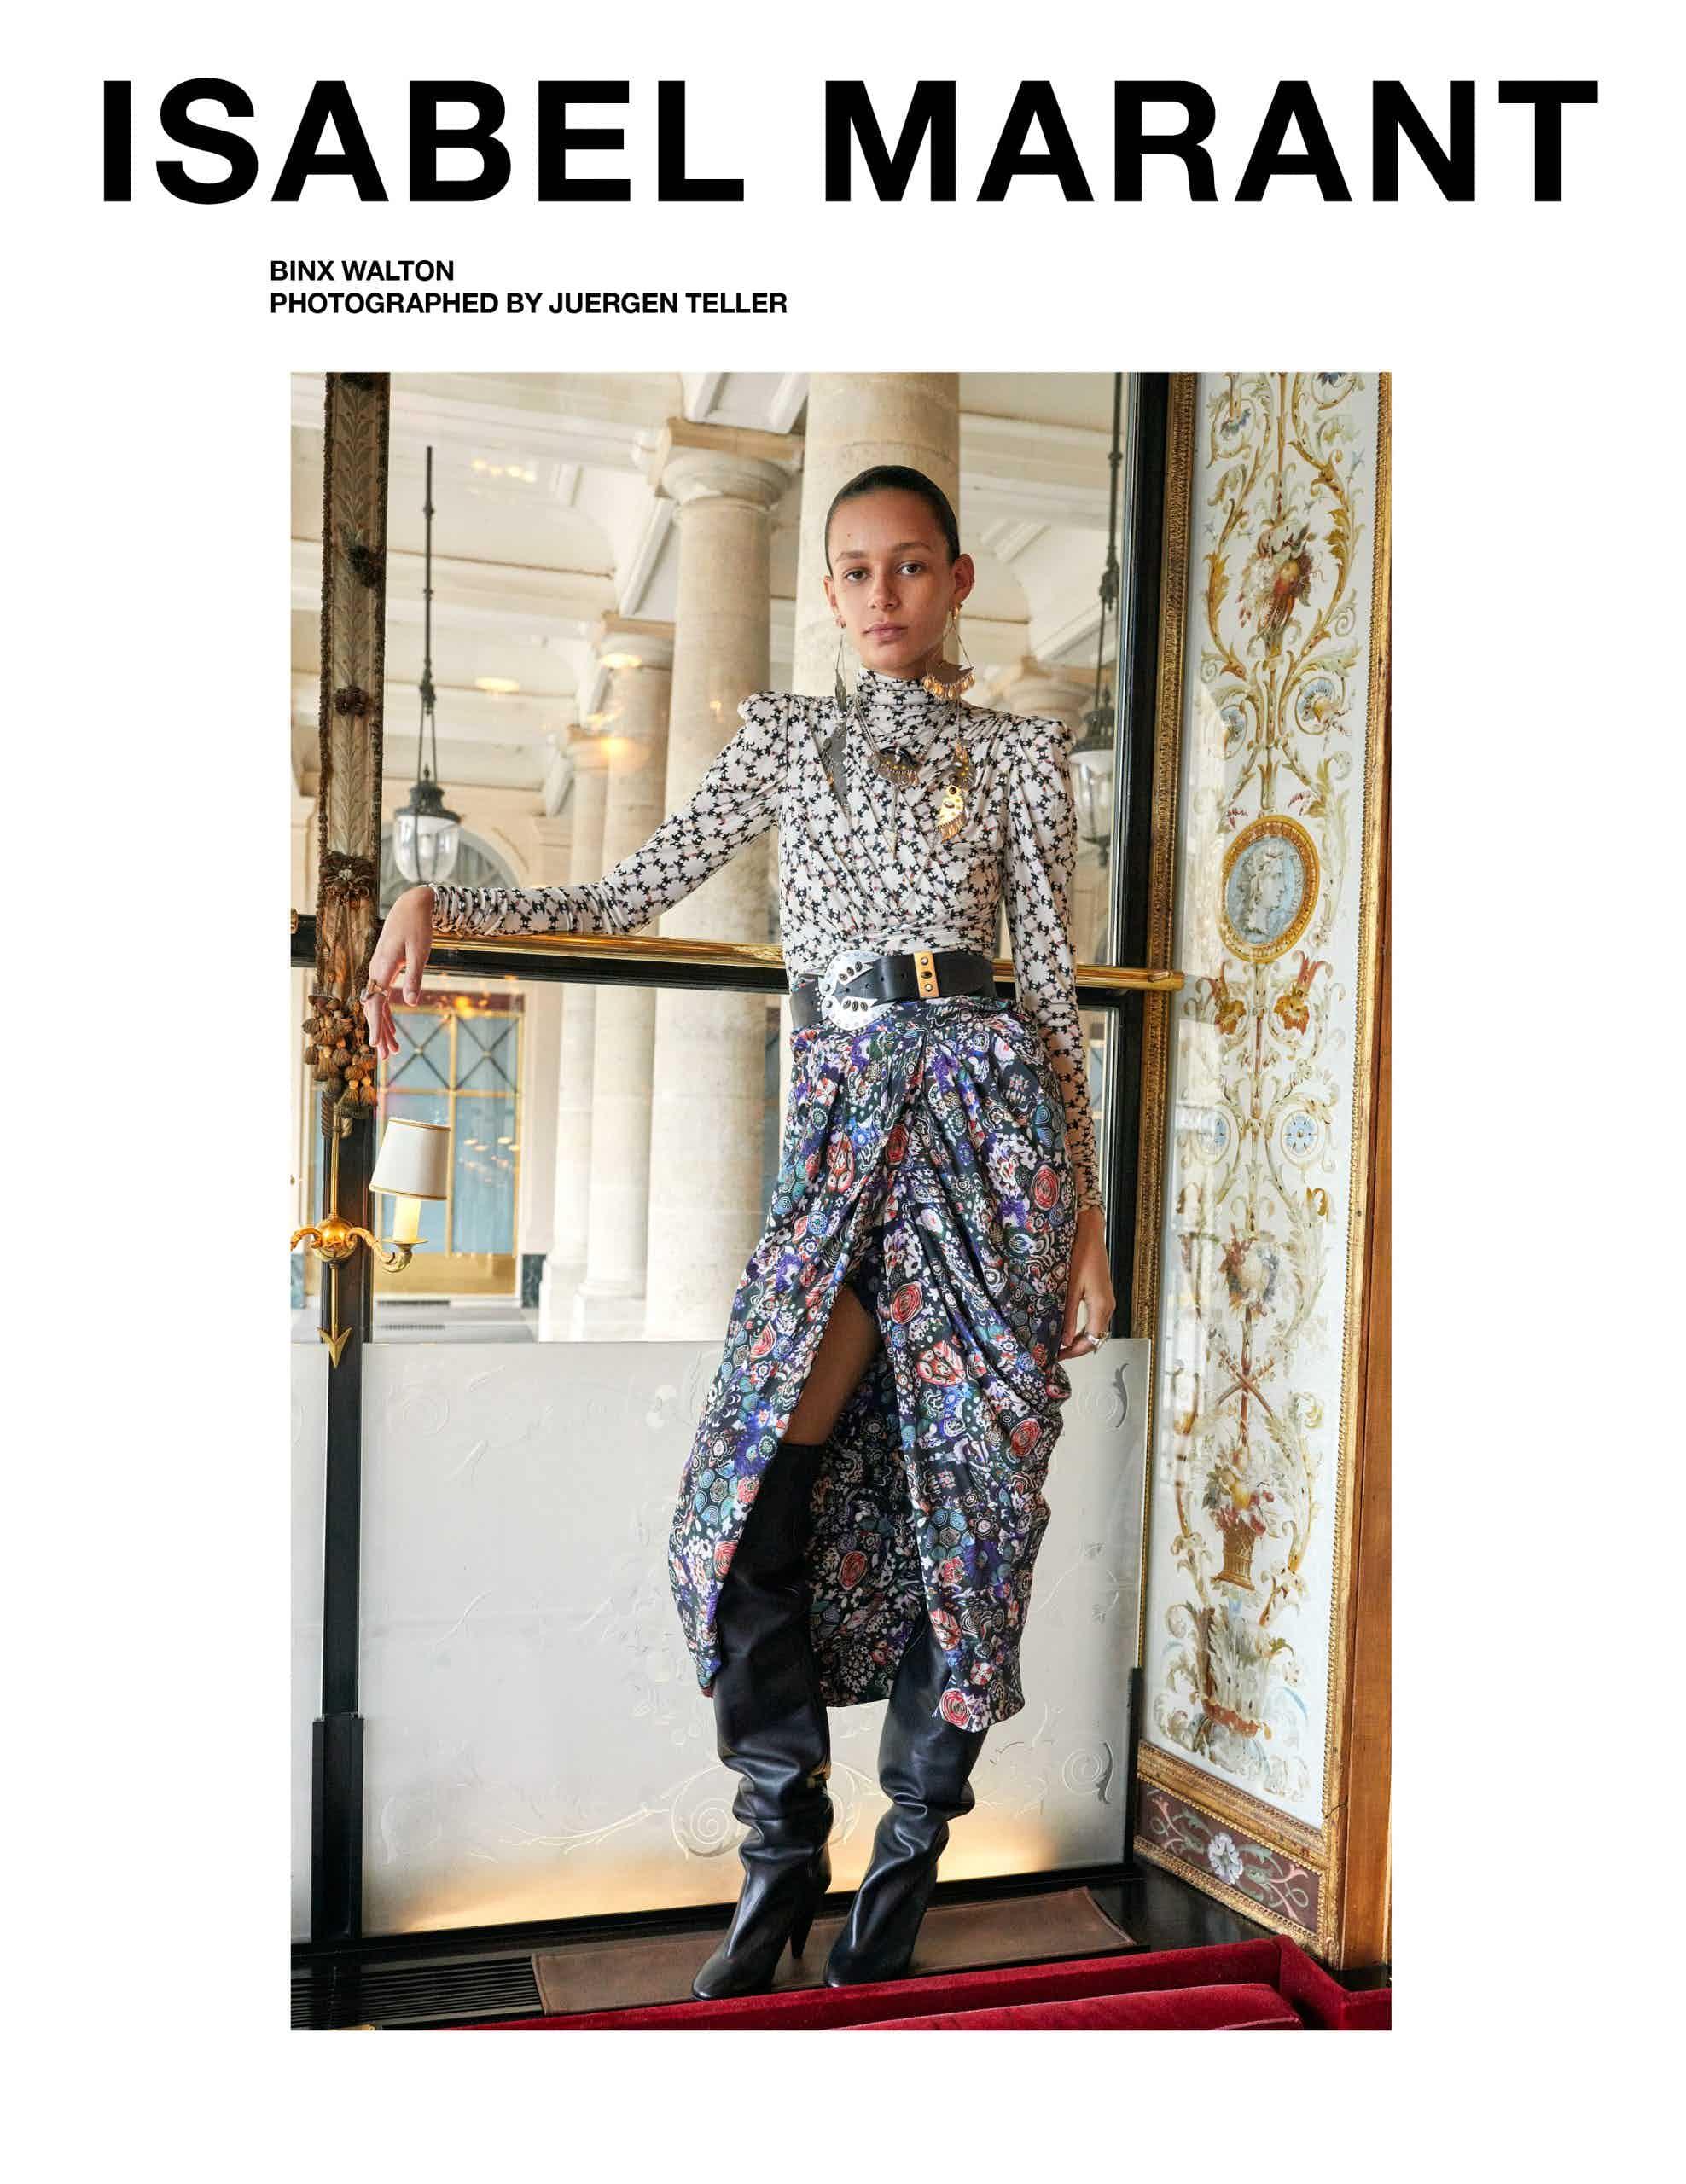 ISABEL MARANT - Fall 2019 Campaign Photographer: Juergen Teller Model: Anna Ewers, Cara Tylor, Binx, Parker Van Noord Stylist: Géraldine Saglio Location: Paris